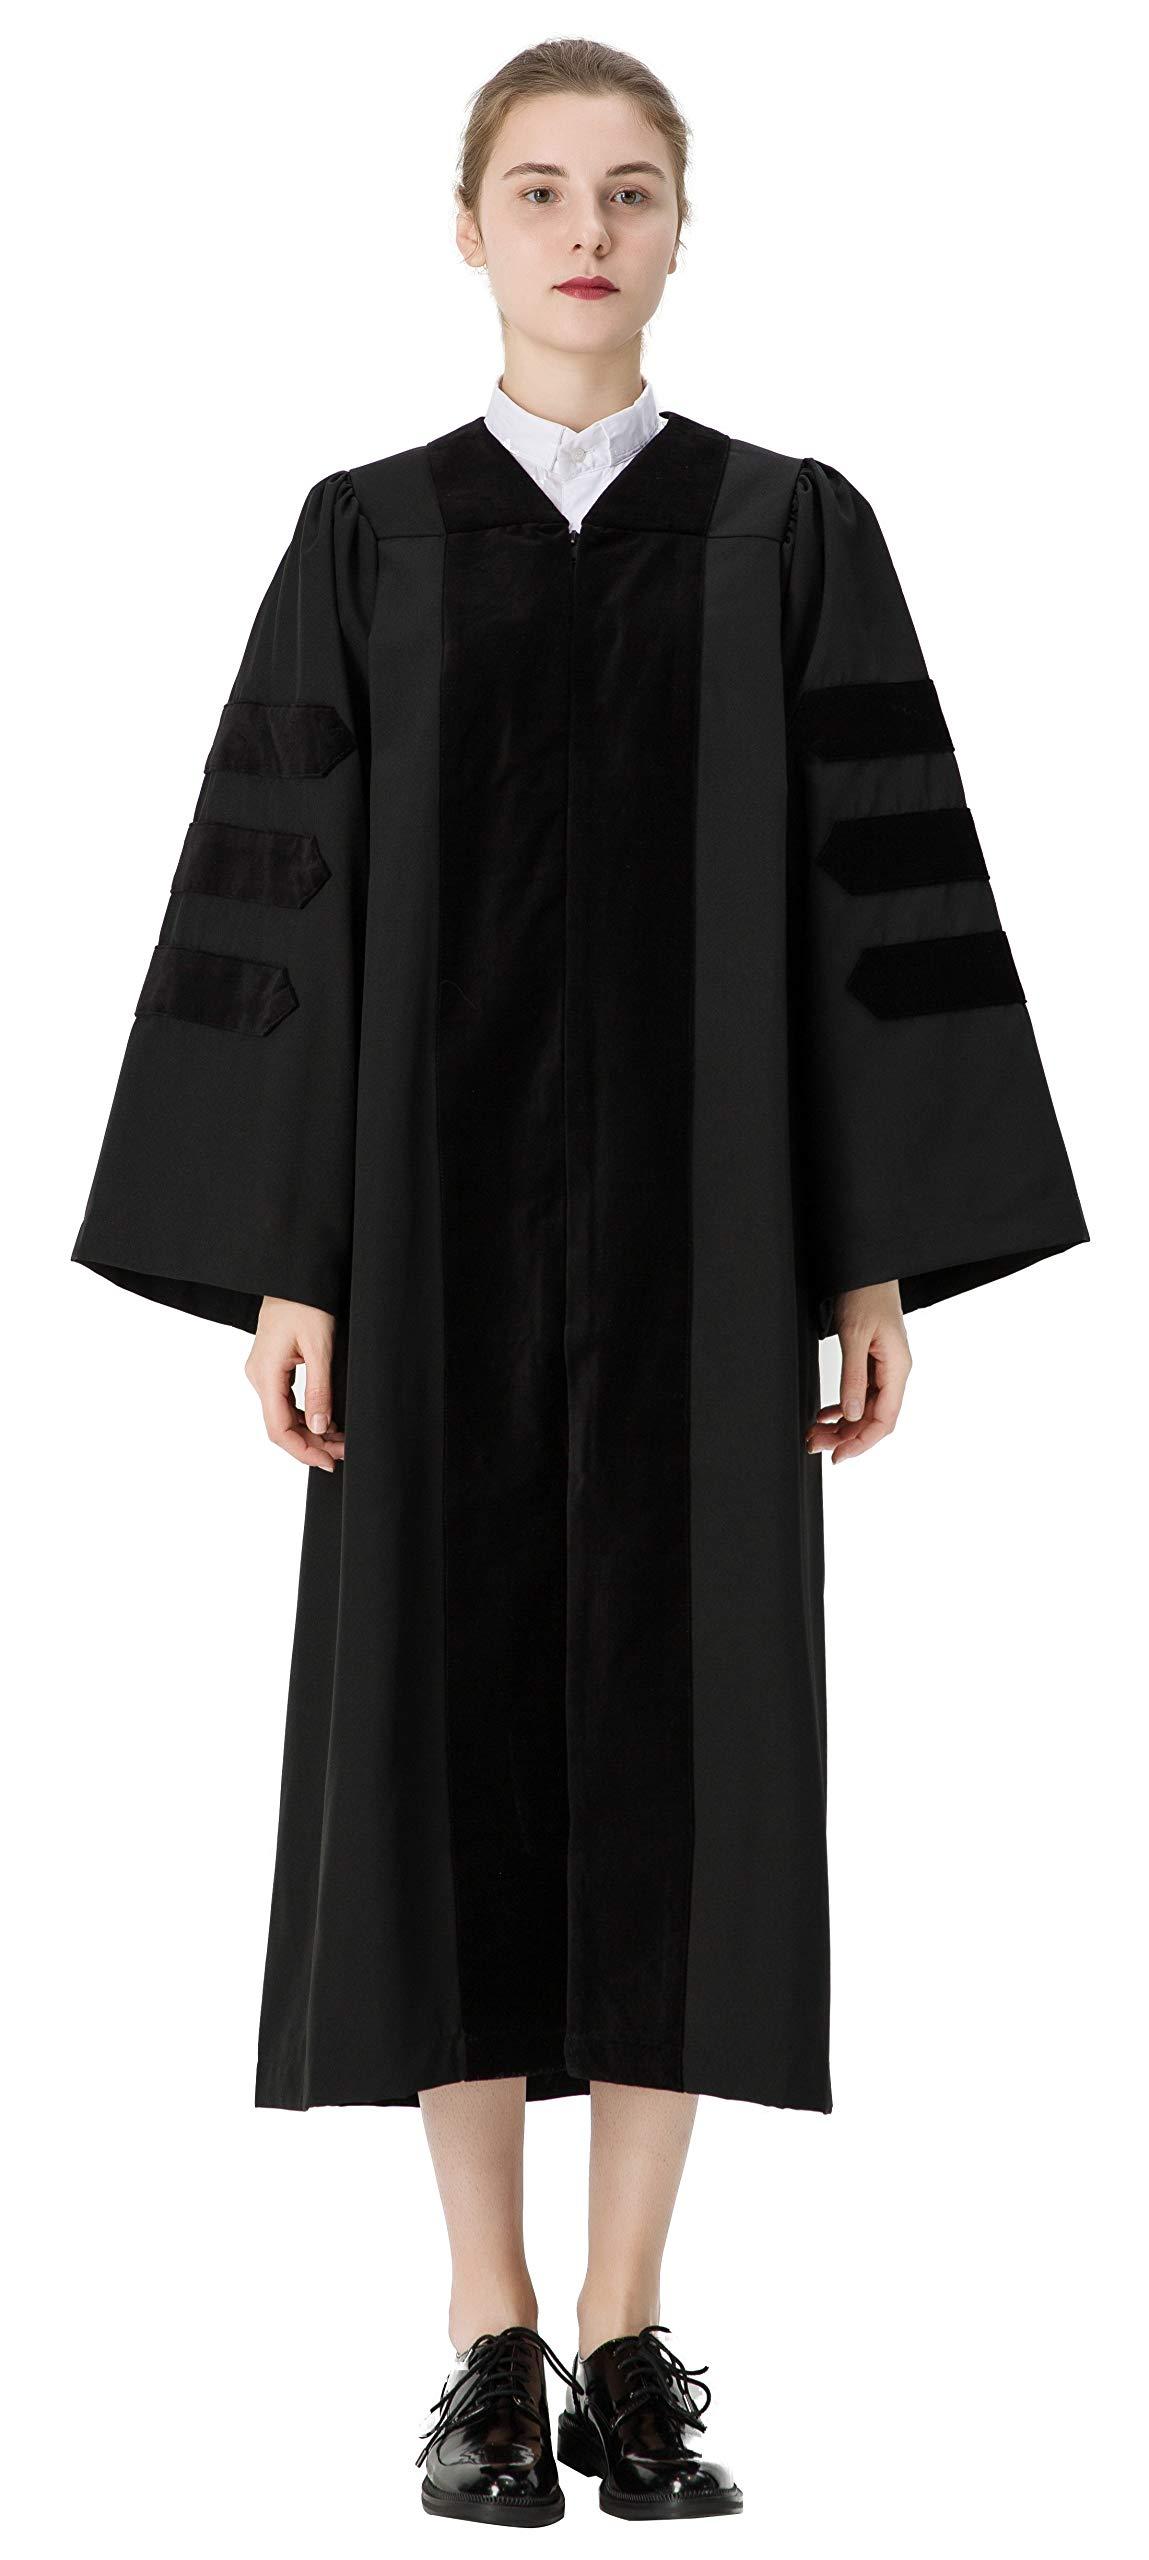 GraduationMall Classic Doctoral Graduation Gown With Black Velvet Trim 54(5'9''-5'11'')